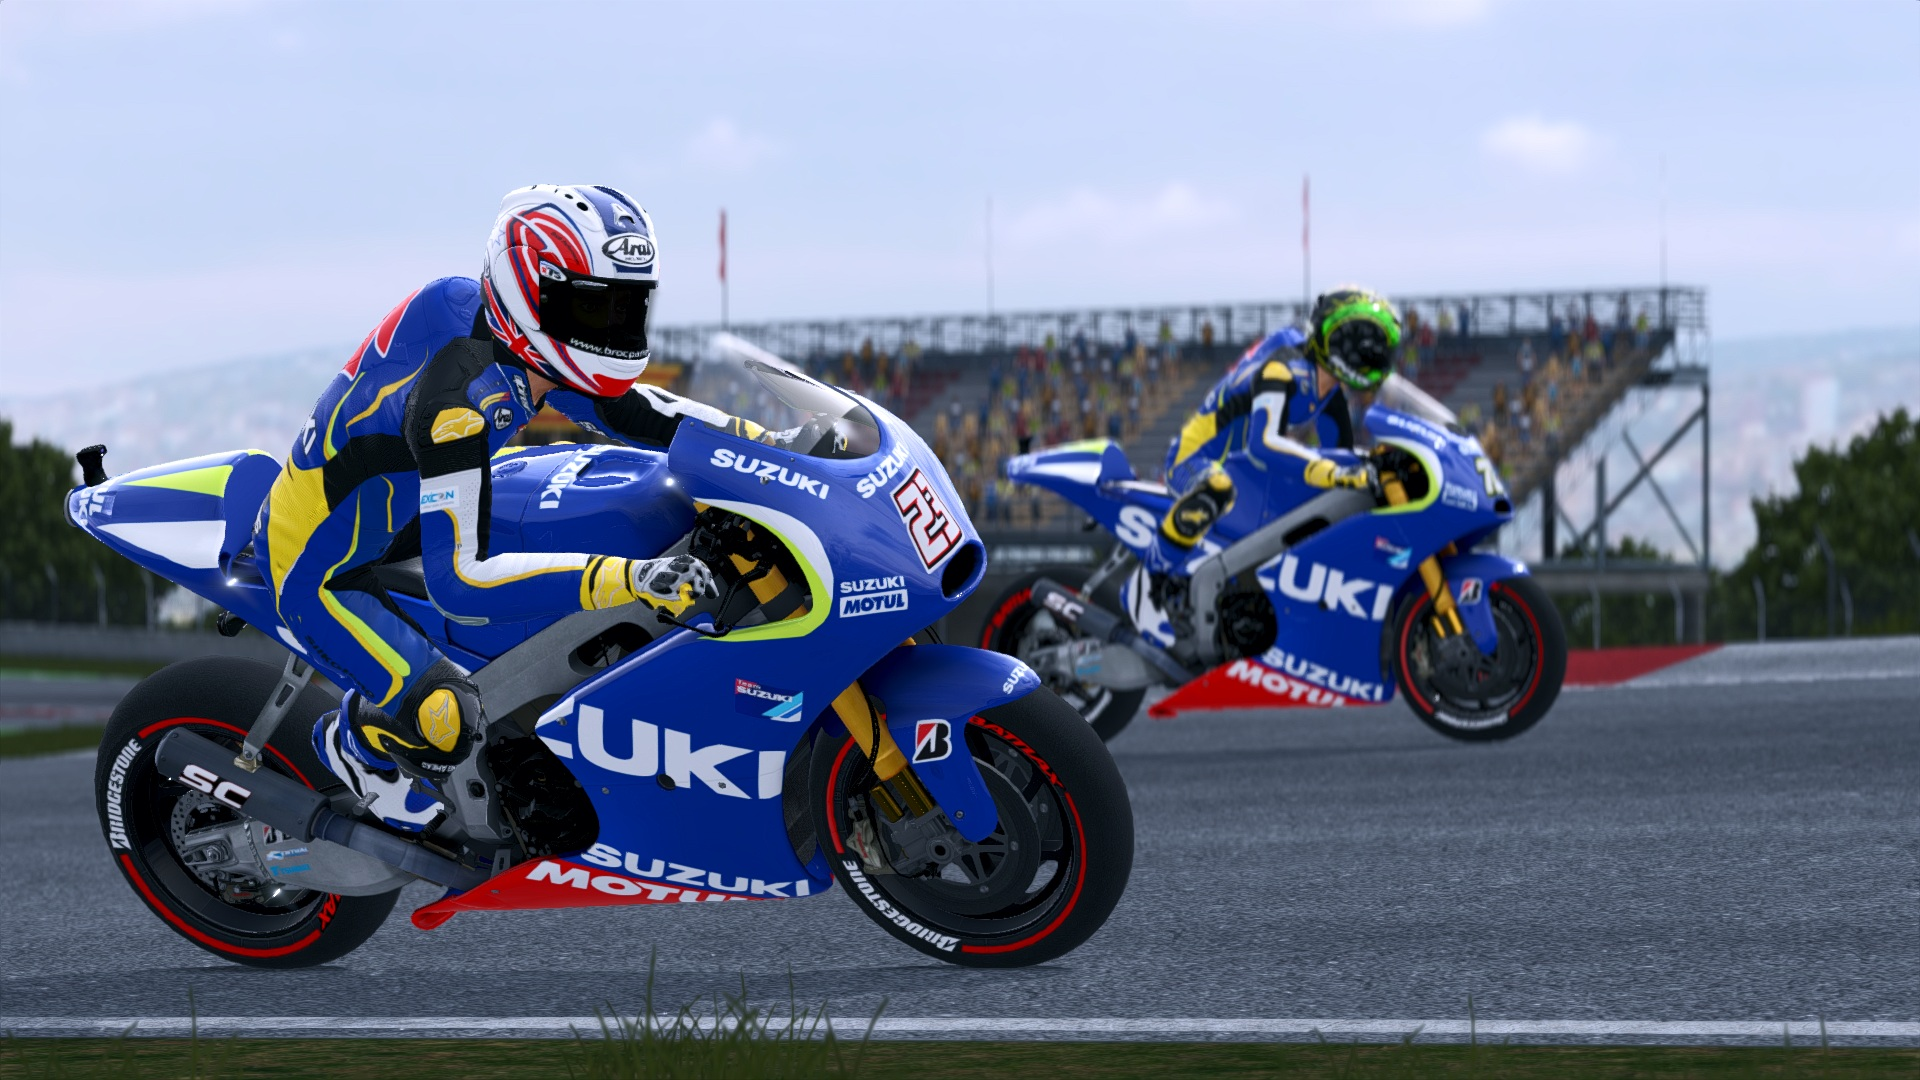 New MotoGP 15 Video Shows off The Catalunya Circuit